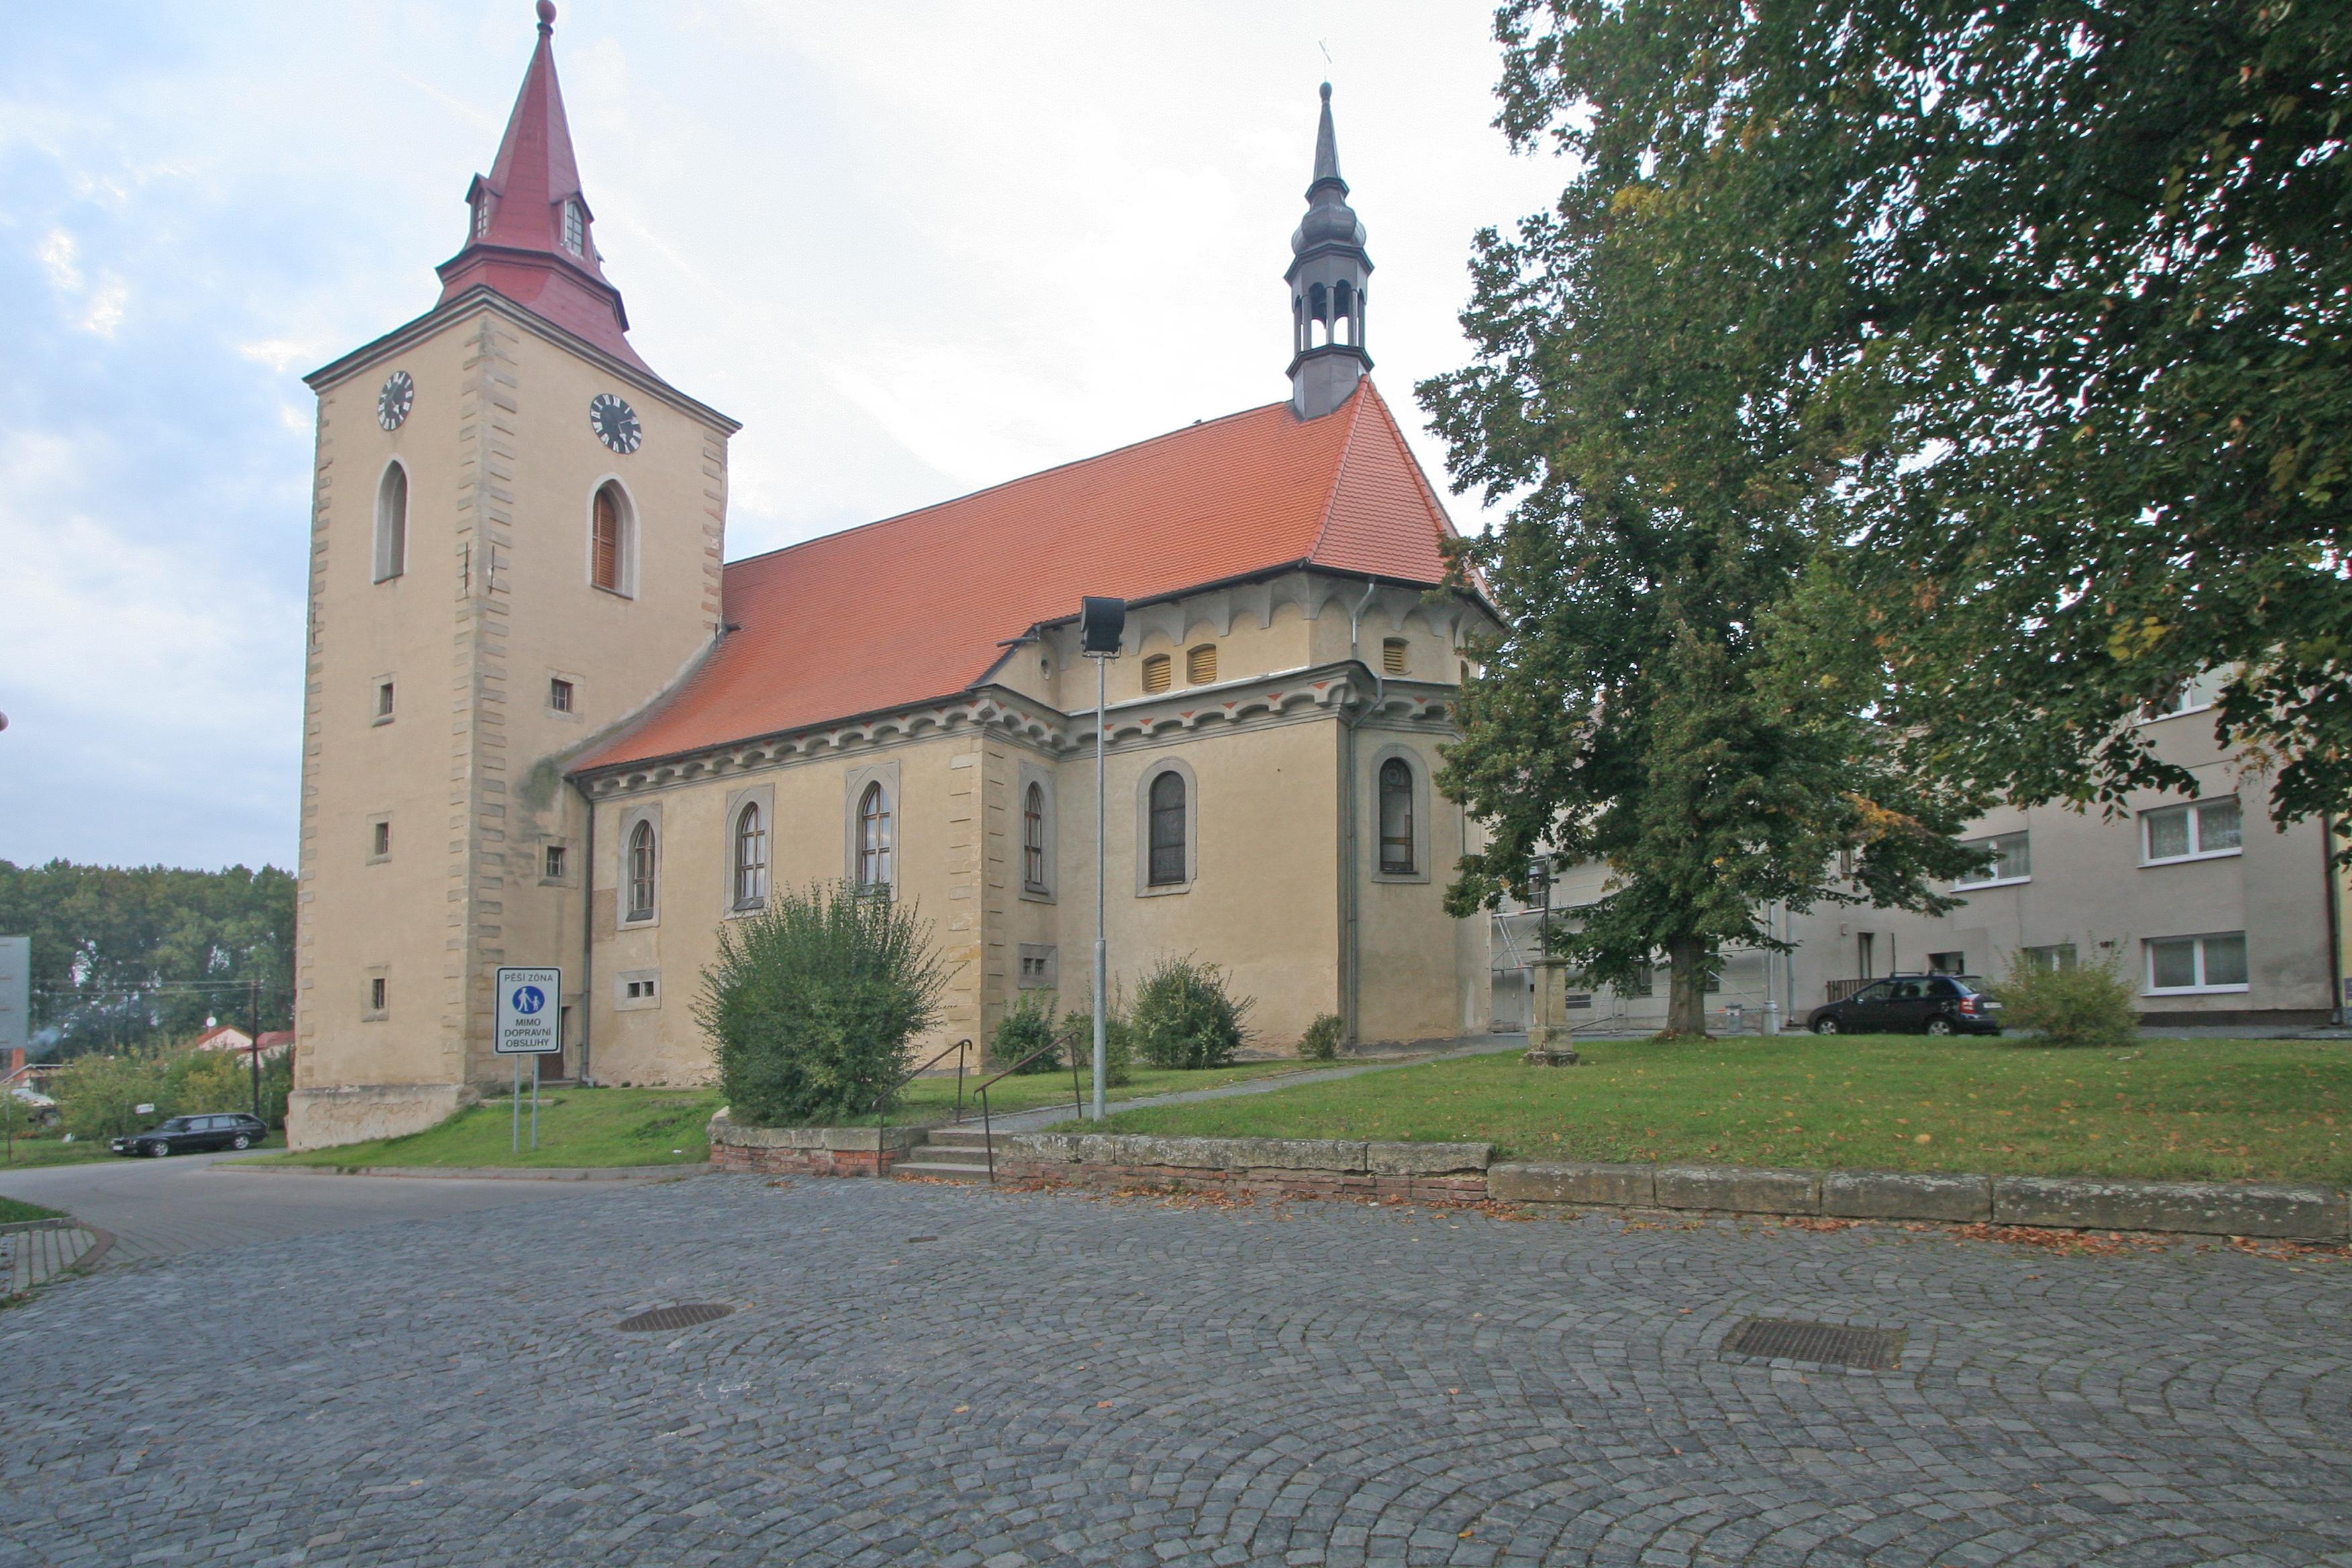 https://upload.wikimedia.org/wikipedia/commons/3/3f/Kostel_sv._Bartolom%C4%9Bje_(Bakov_nad_Jizerou)_01.JPG